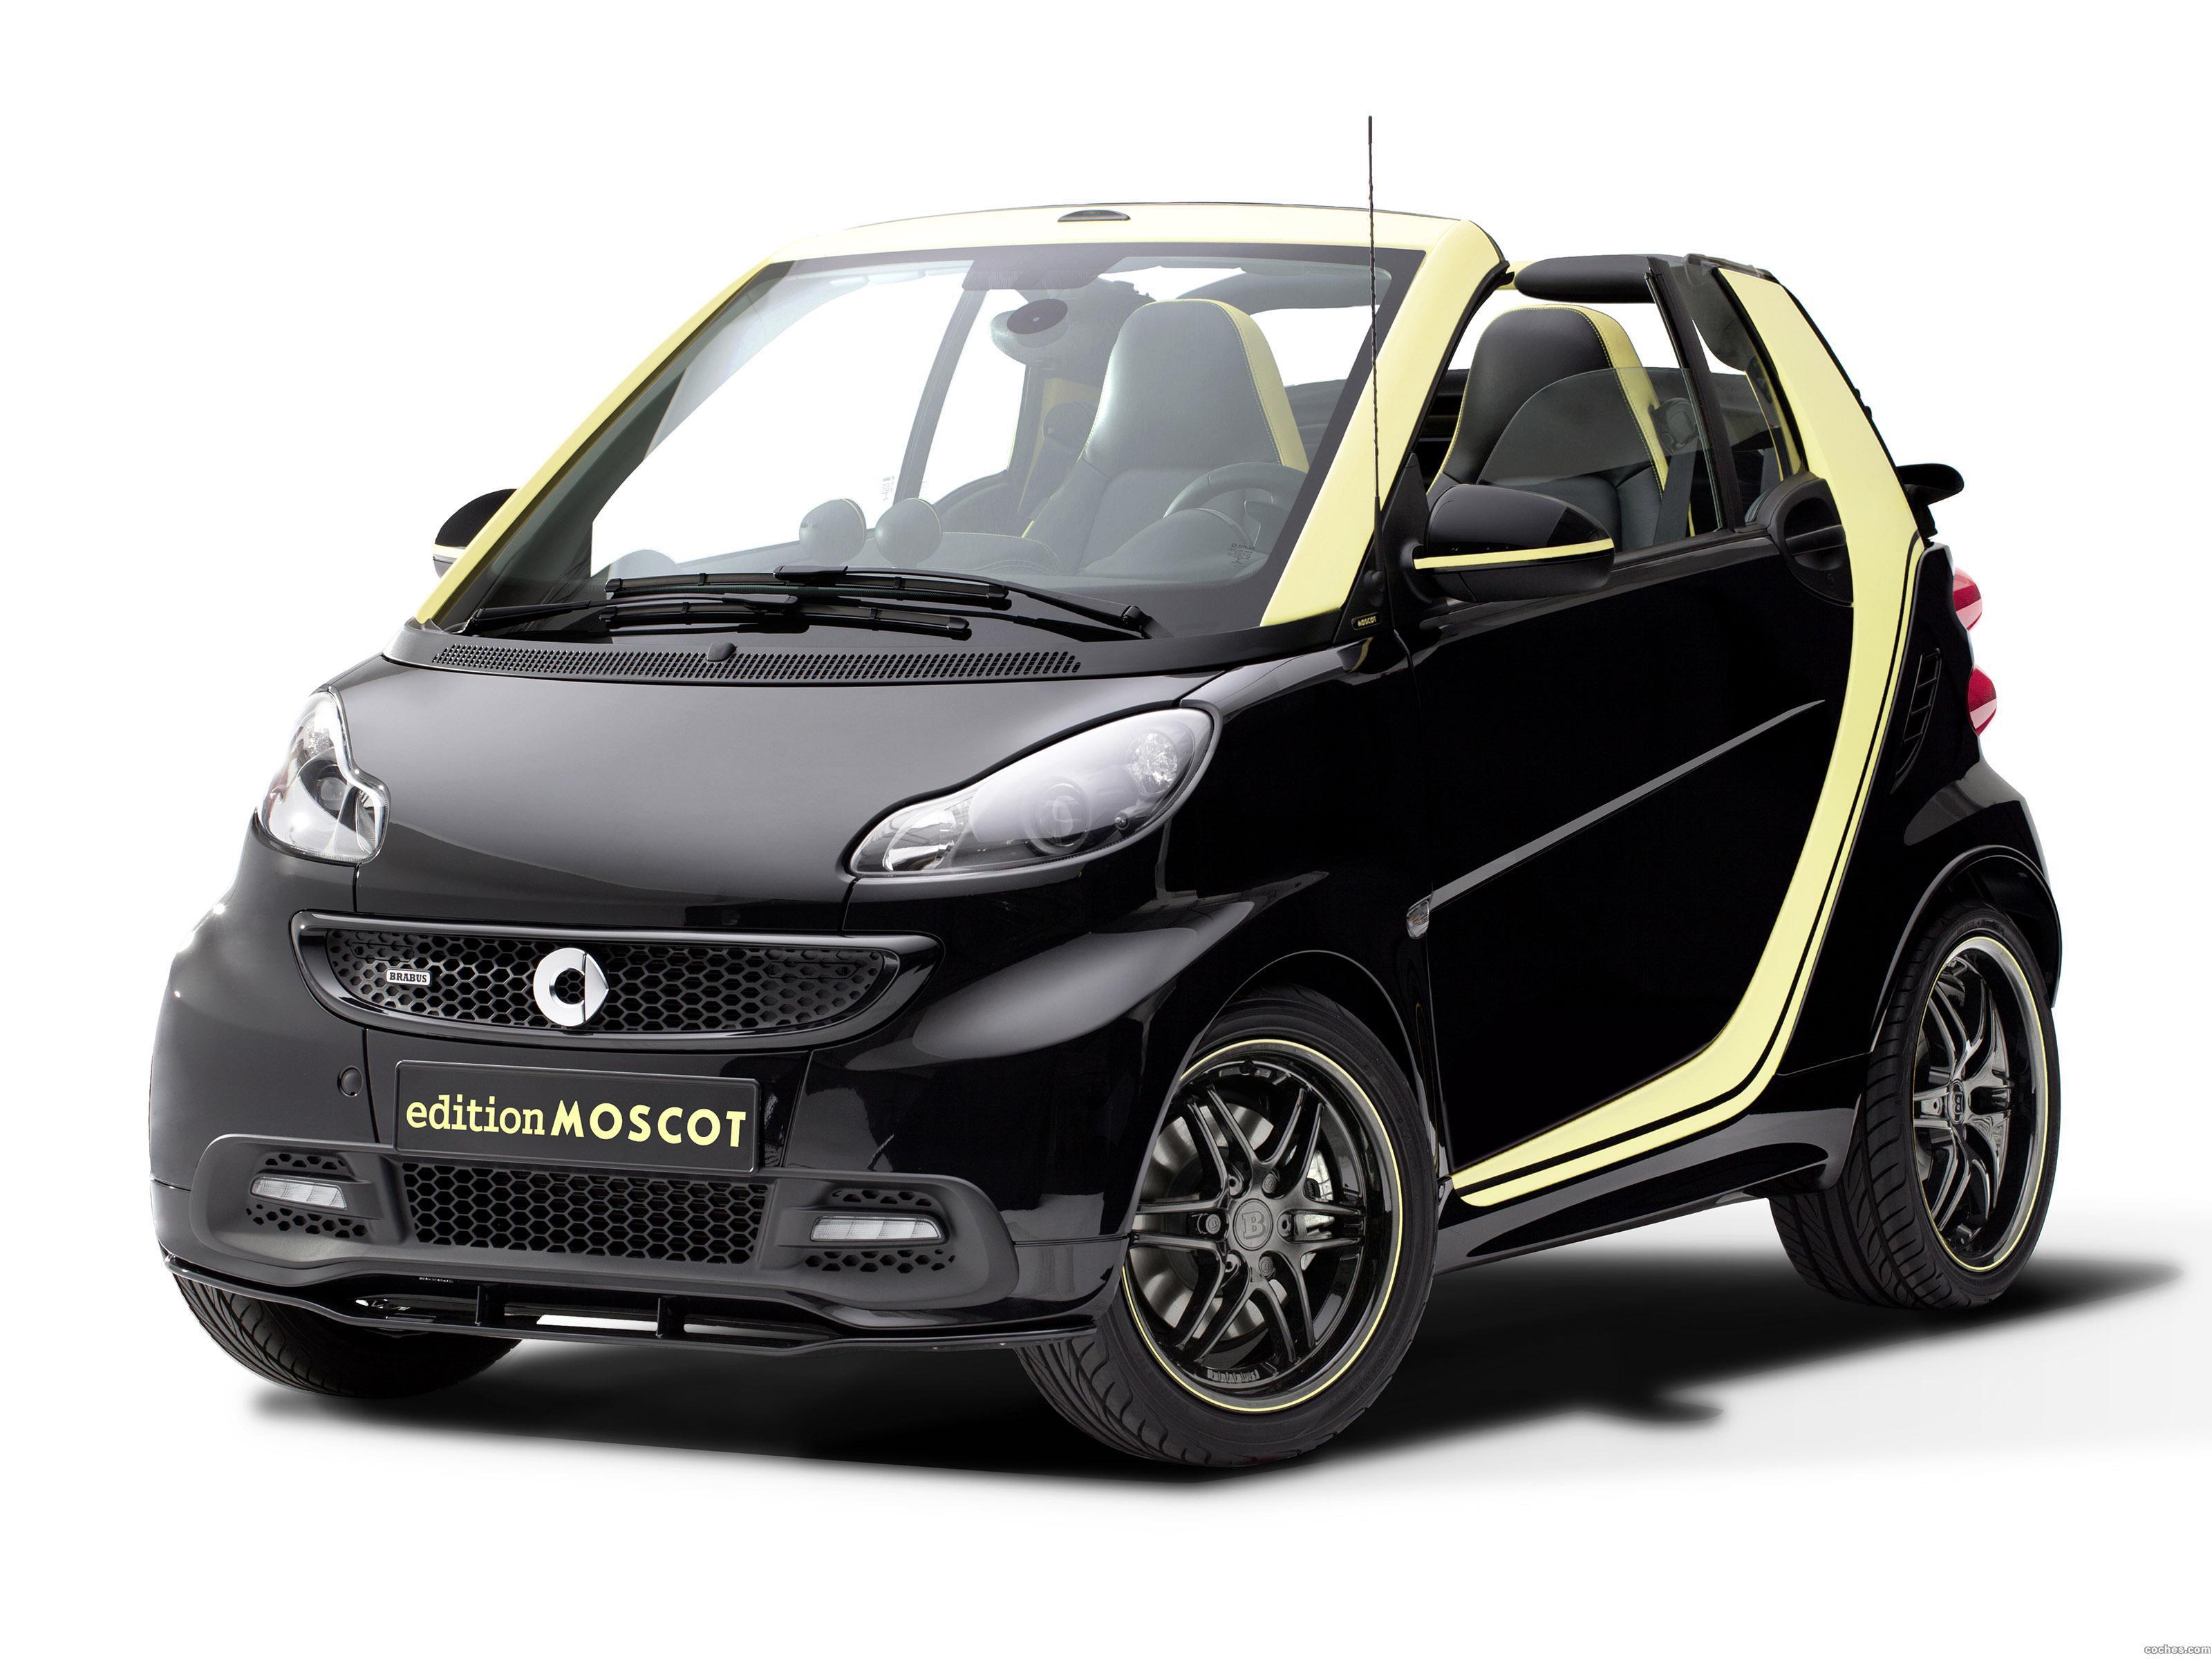 smart_fortwo-moscott-cabrio-c451-2015_r7.jpg